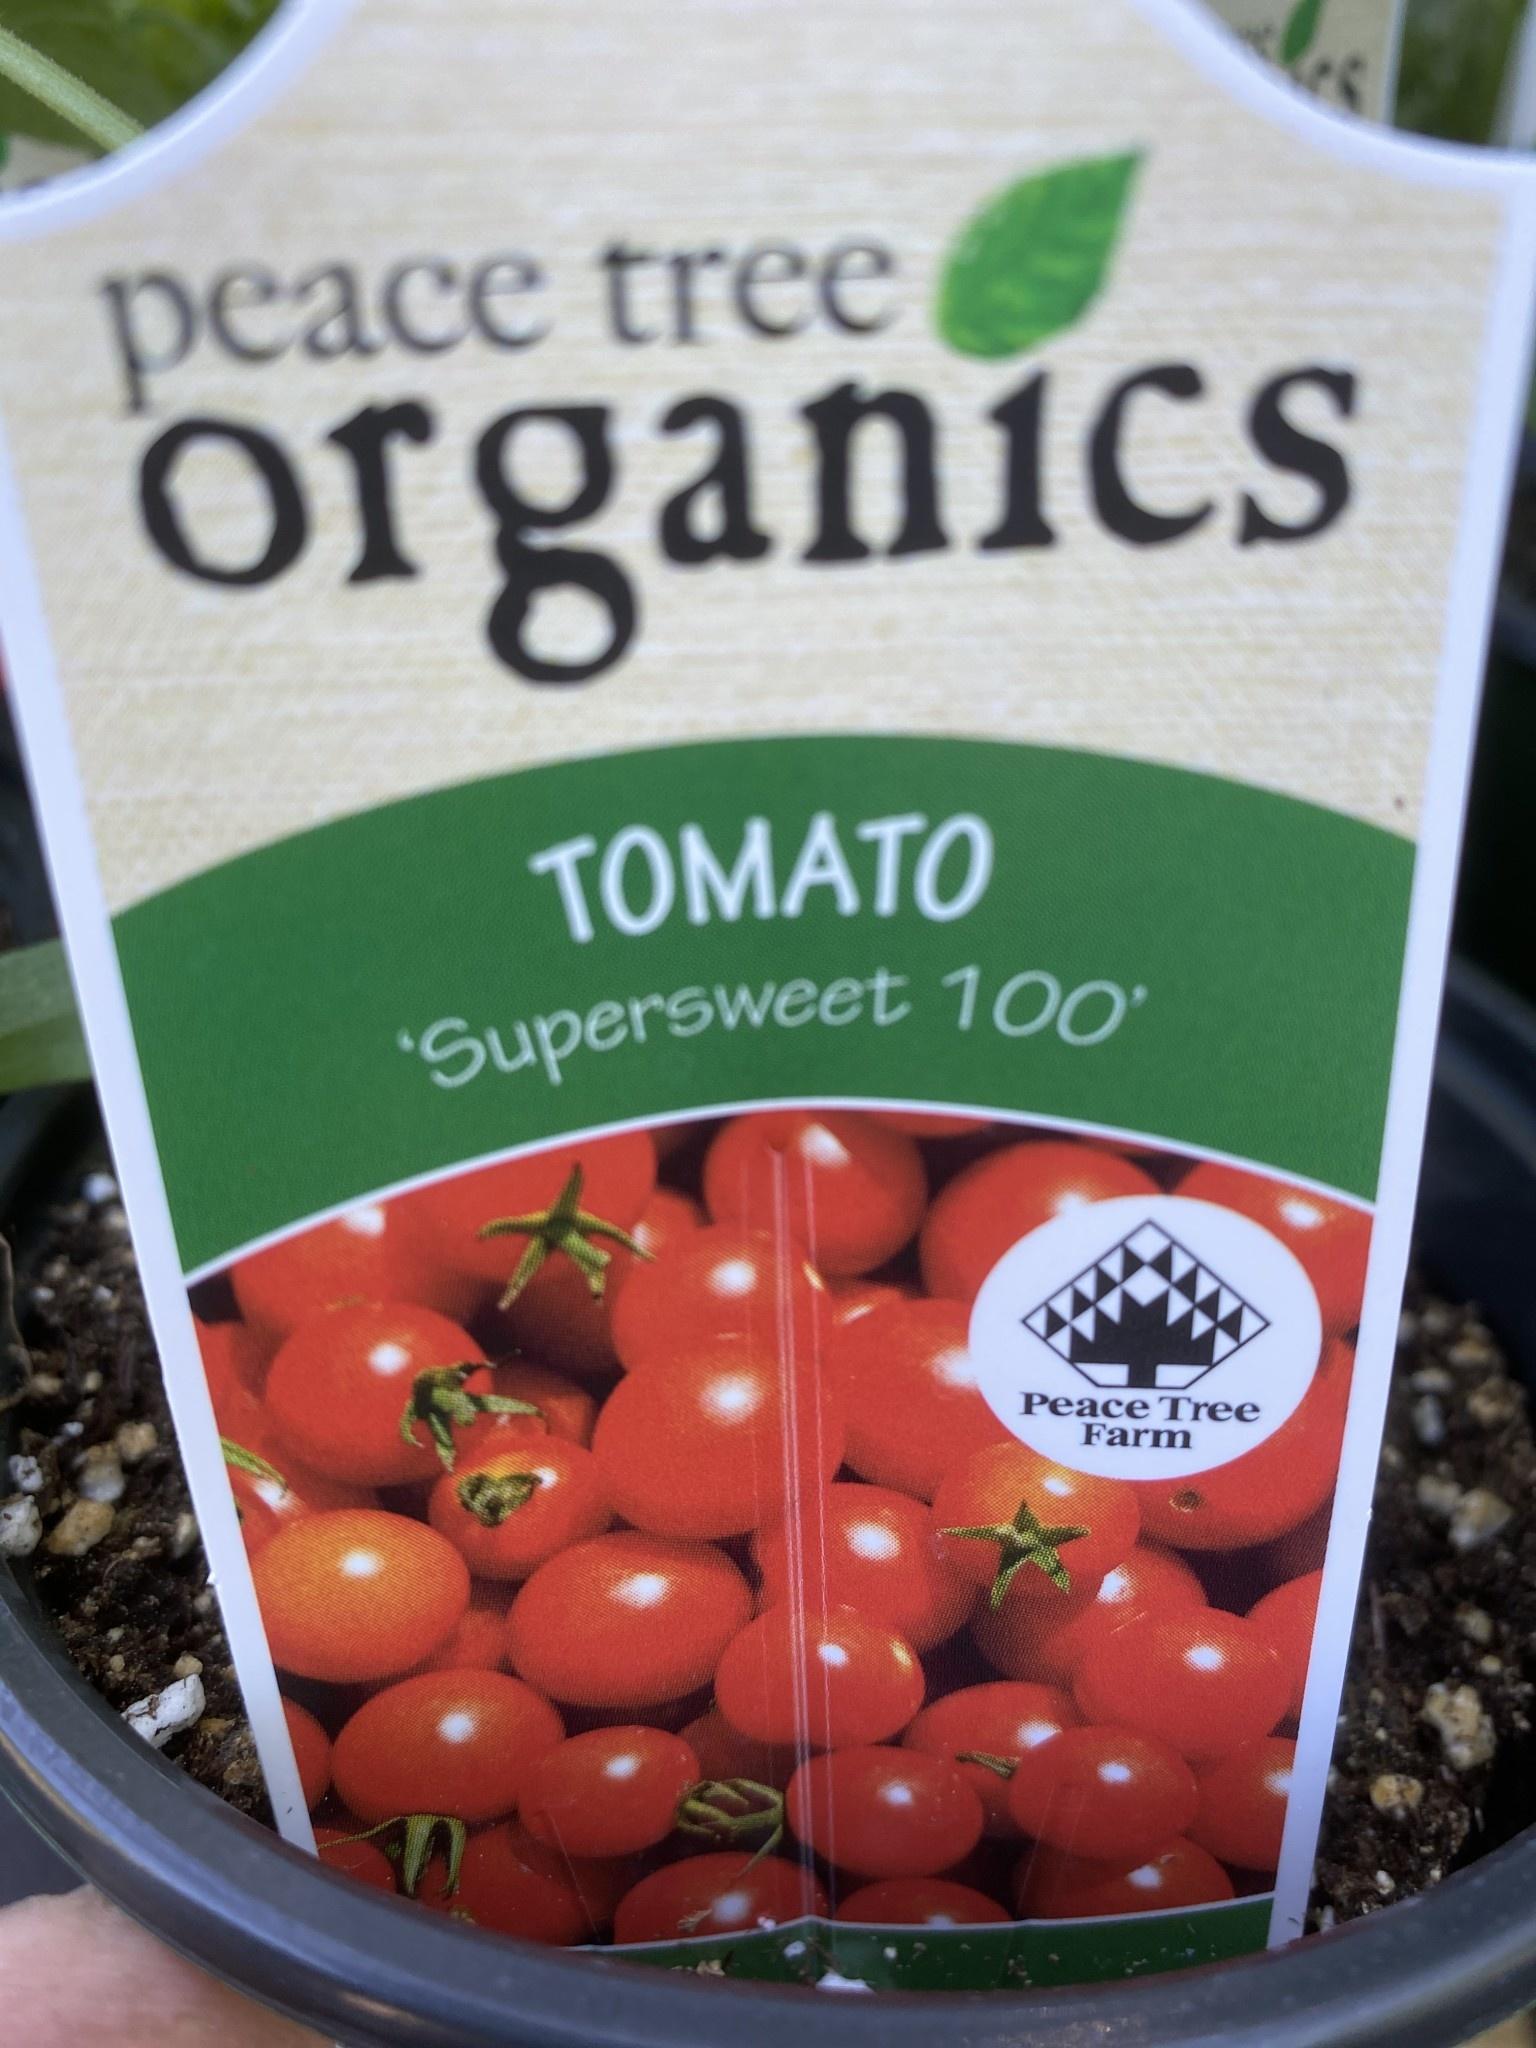 Tomato, Supersweet 100- Vegetable, organic Qt